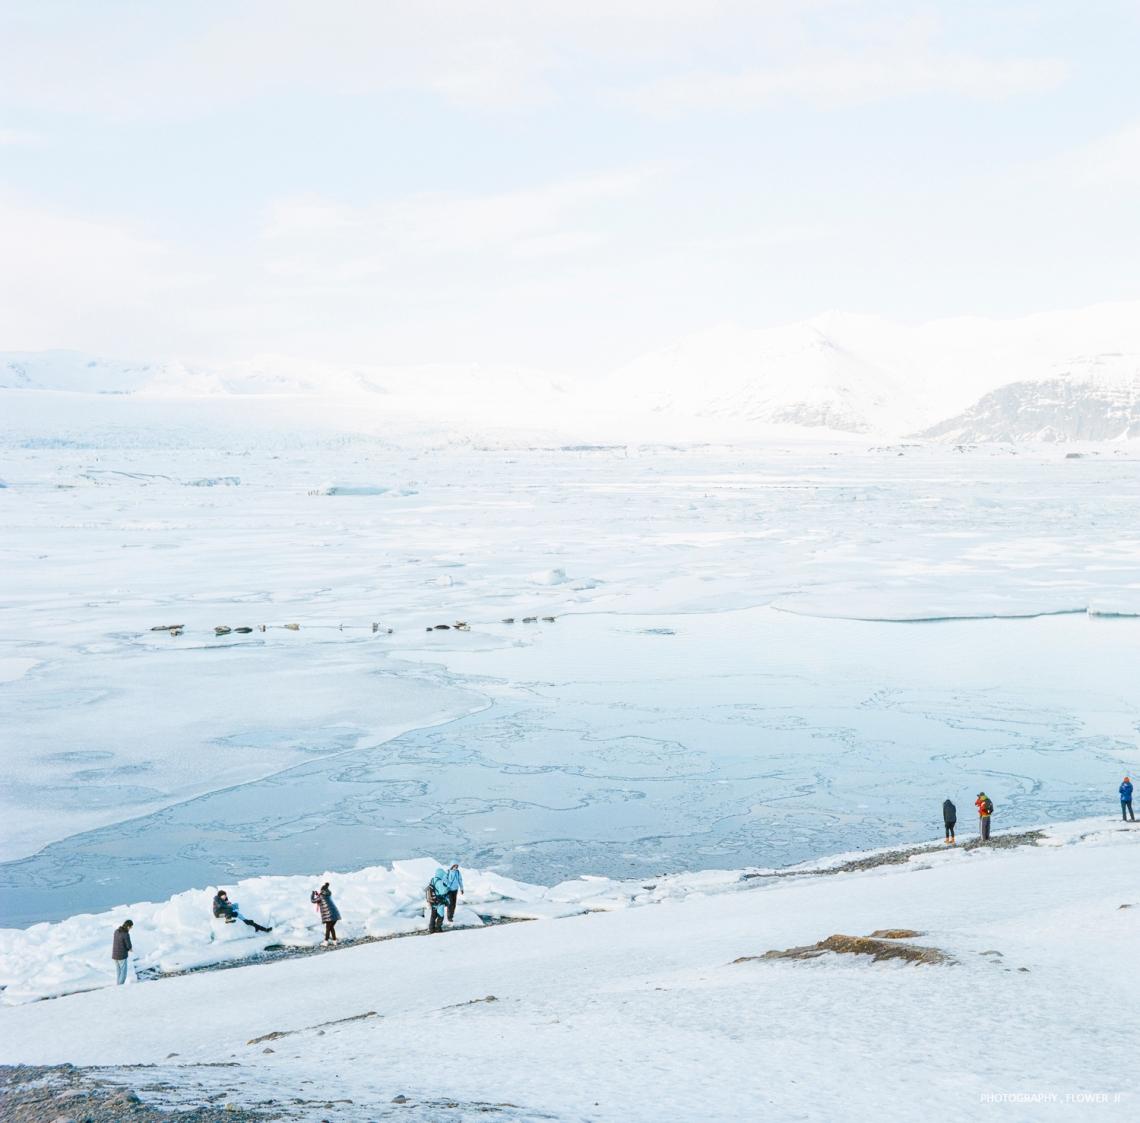 20160304,Jokusarlon,01,Iceland-ss